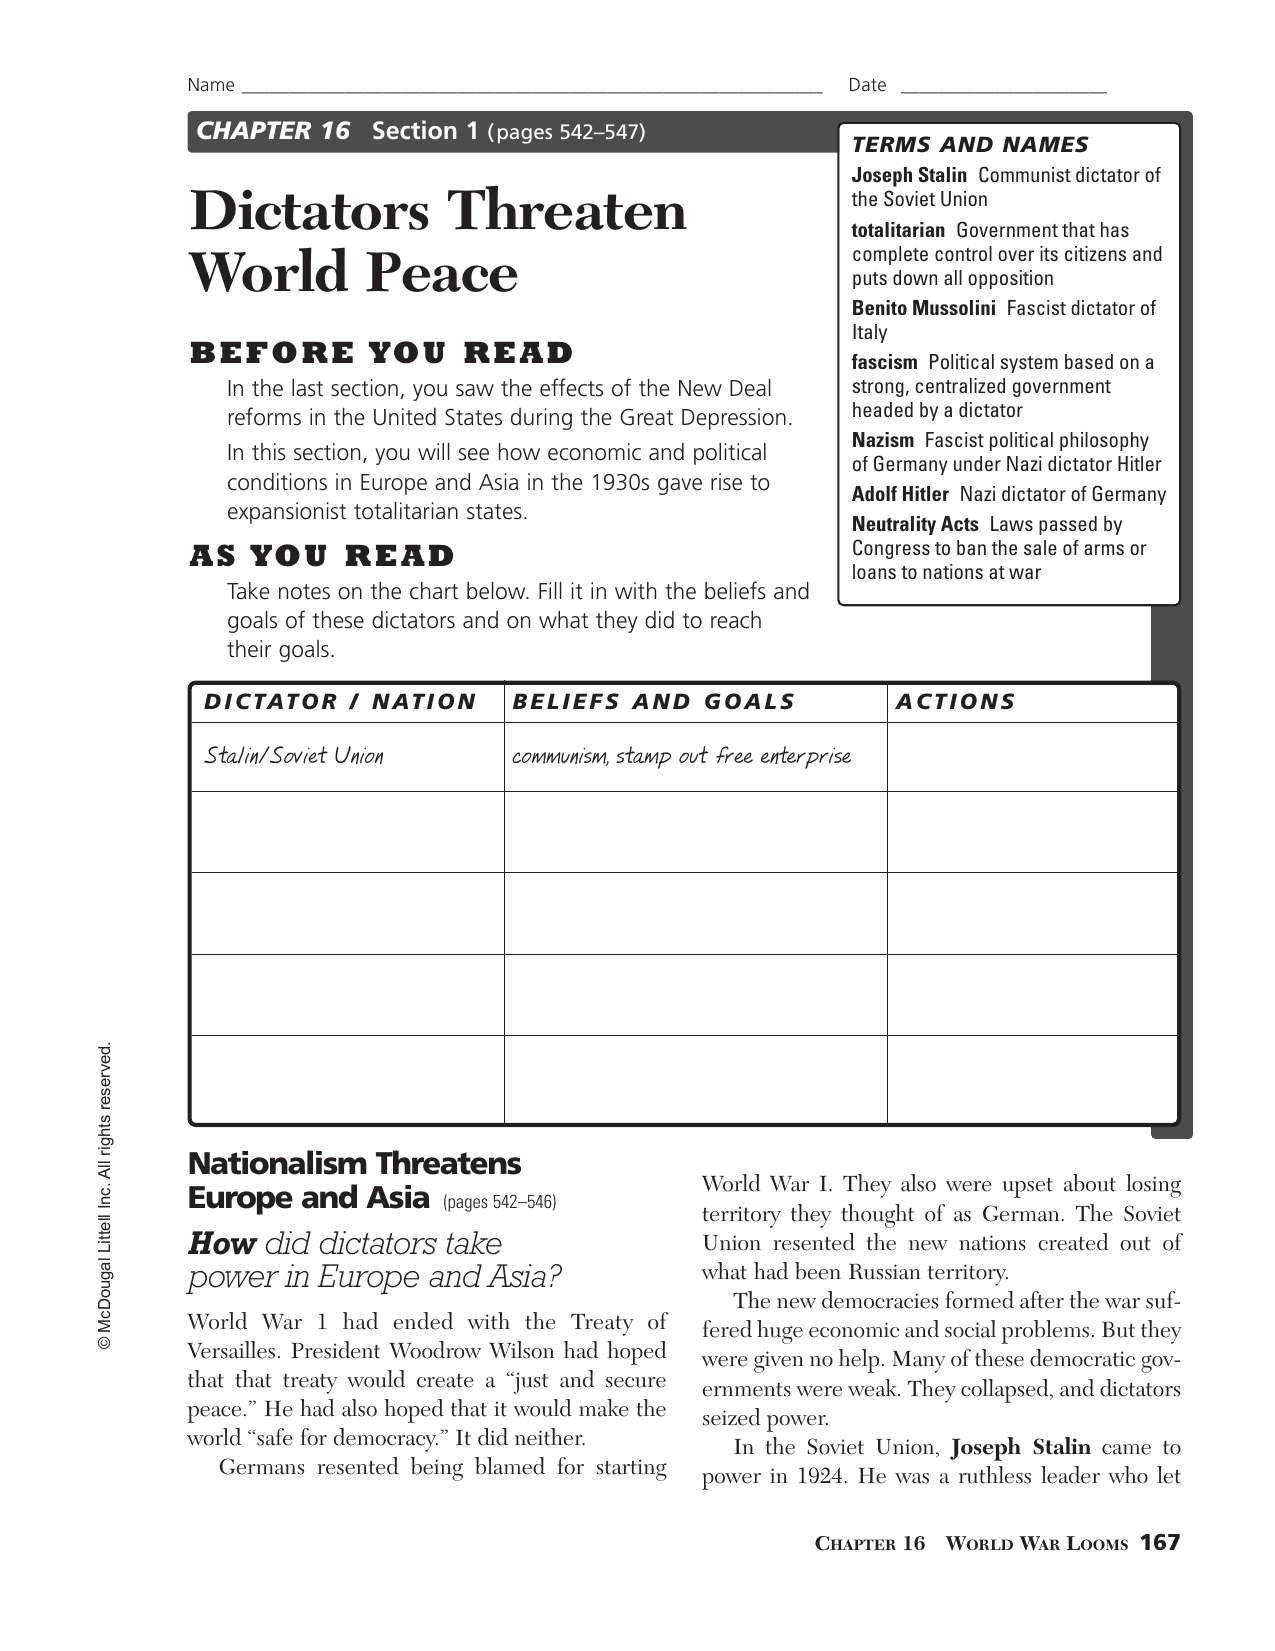 Dictators Threaten World Peace